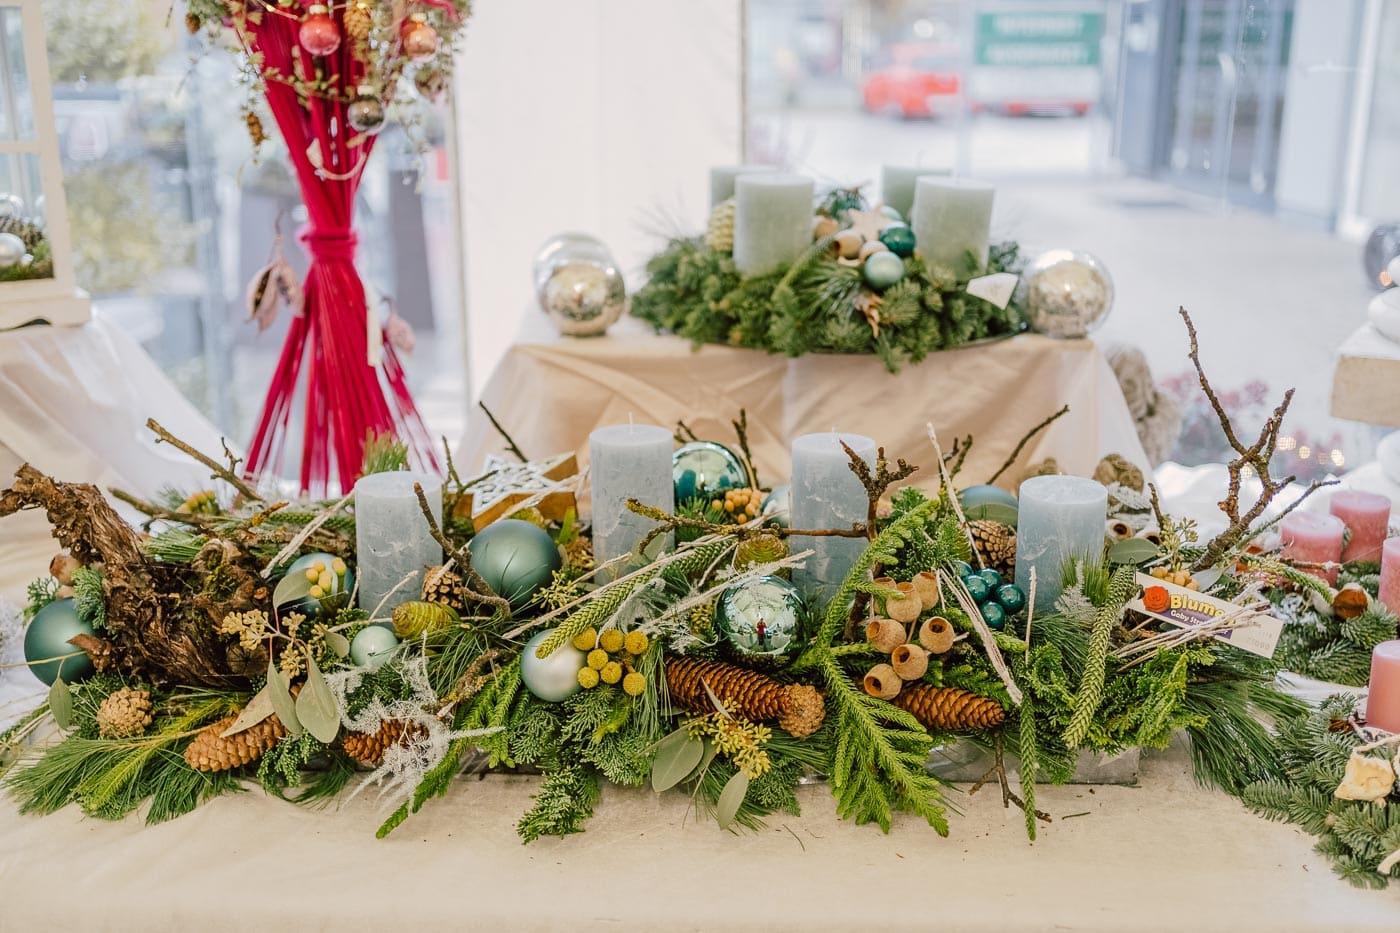 blumen-gaby-strohmeier-graz-saisonales-advent-13